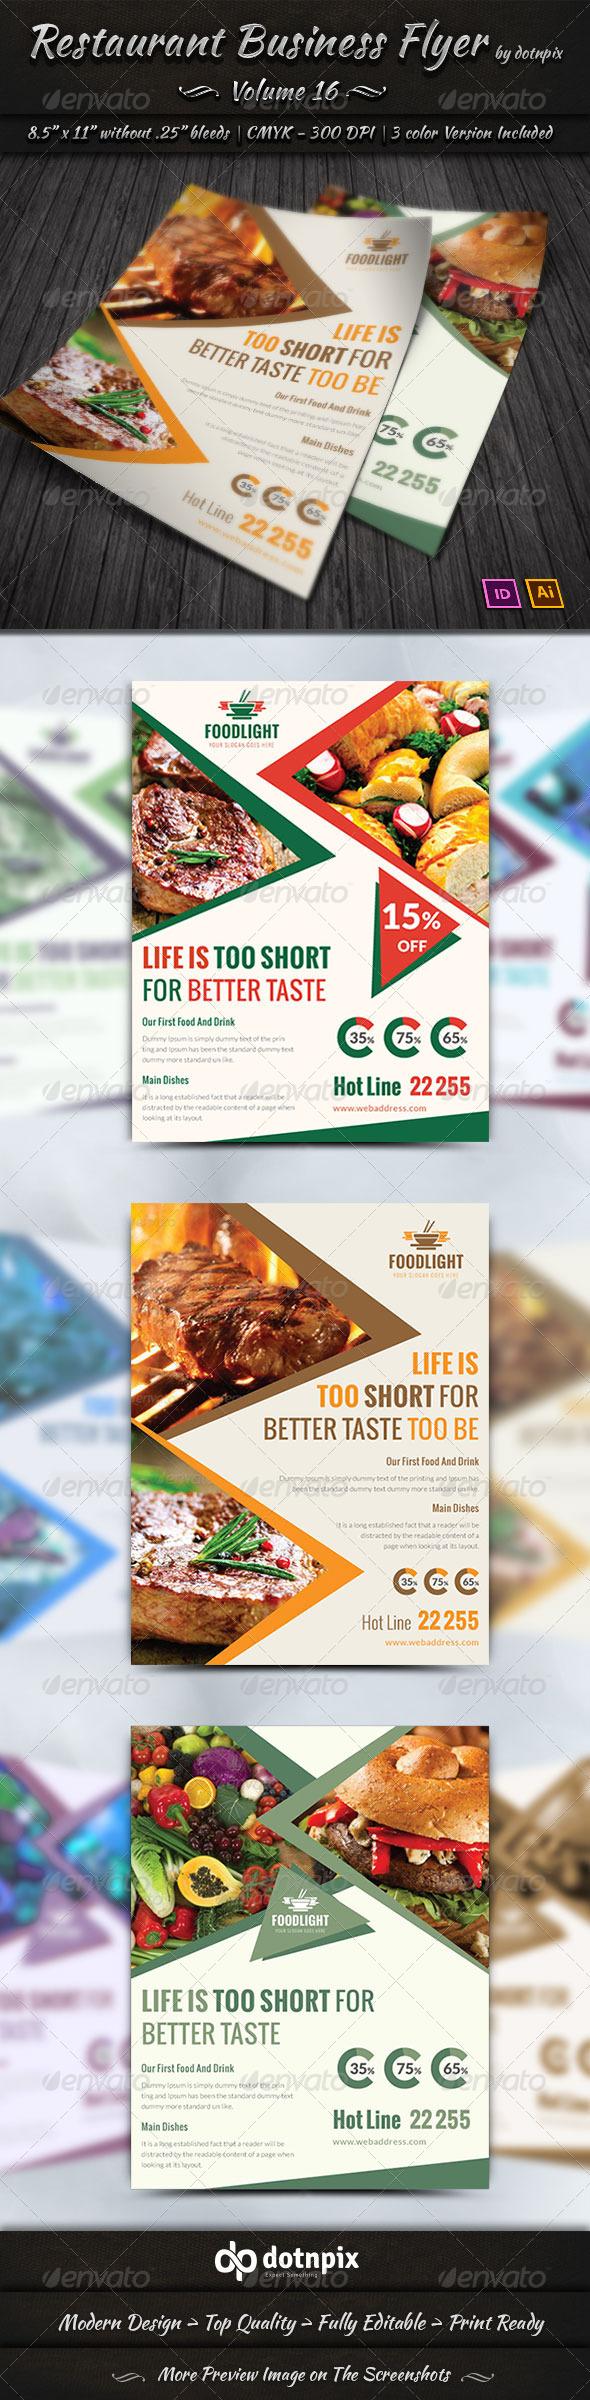 GraphicRiver Restaurant Business Flyer Volume 16 8013368